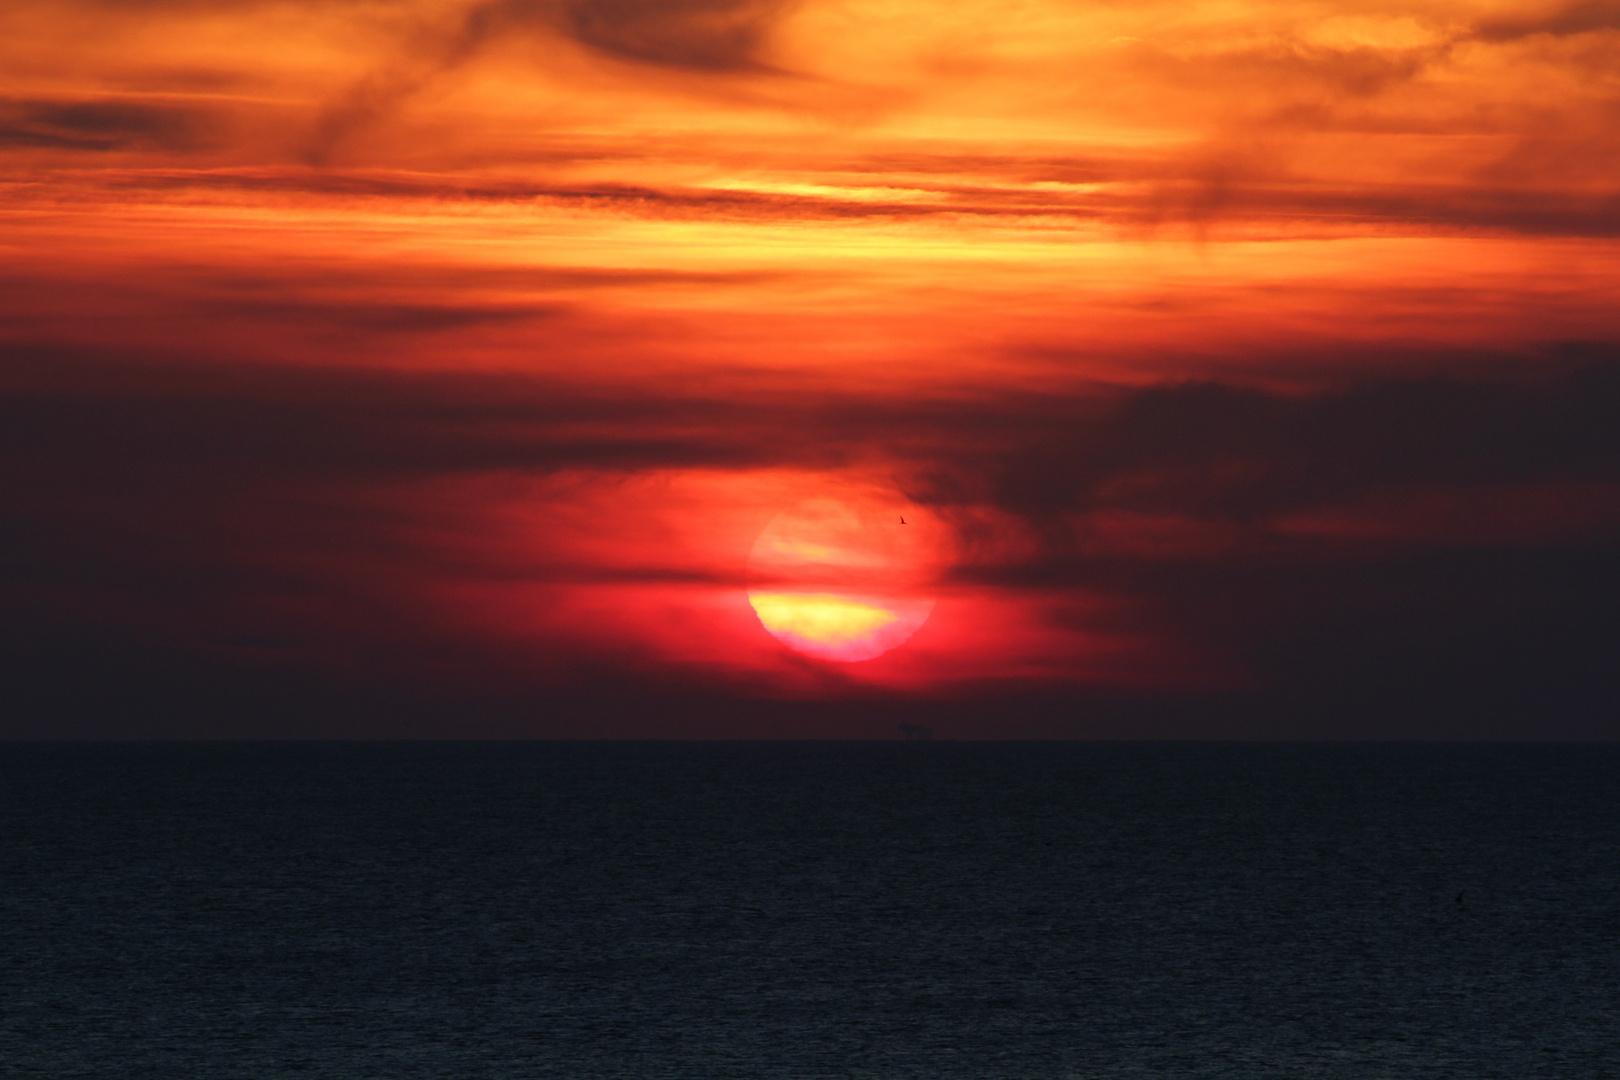 sunset Julianadorp